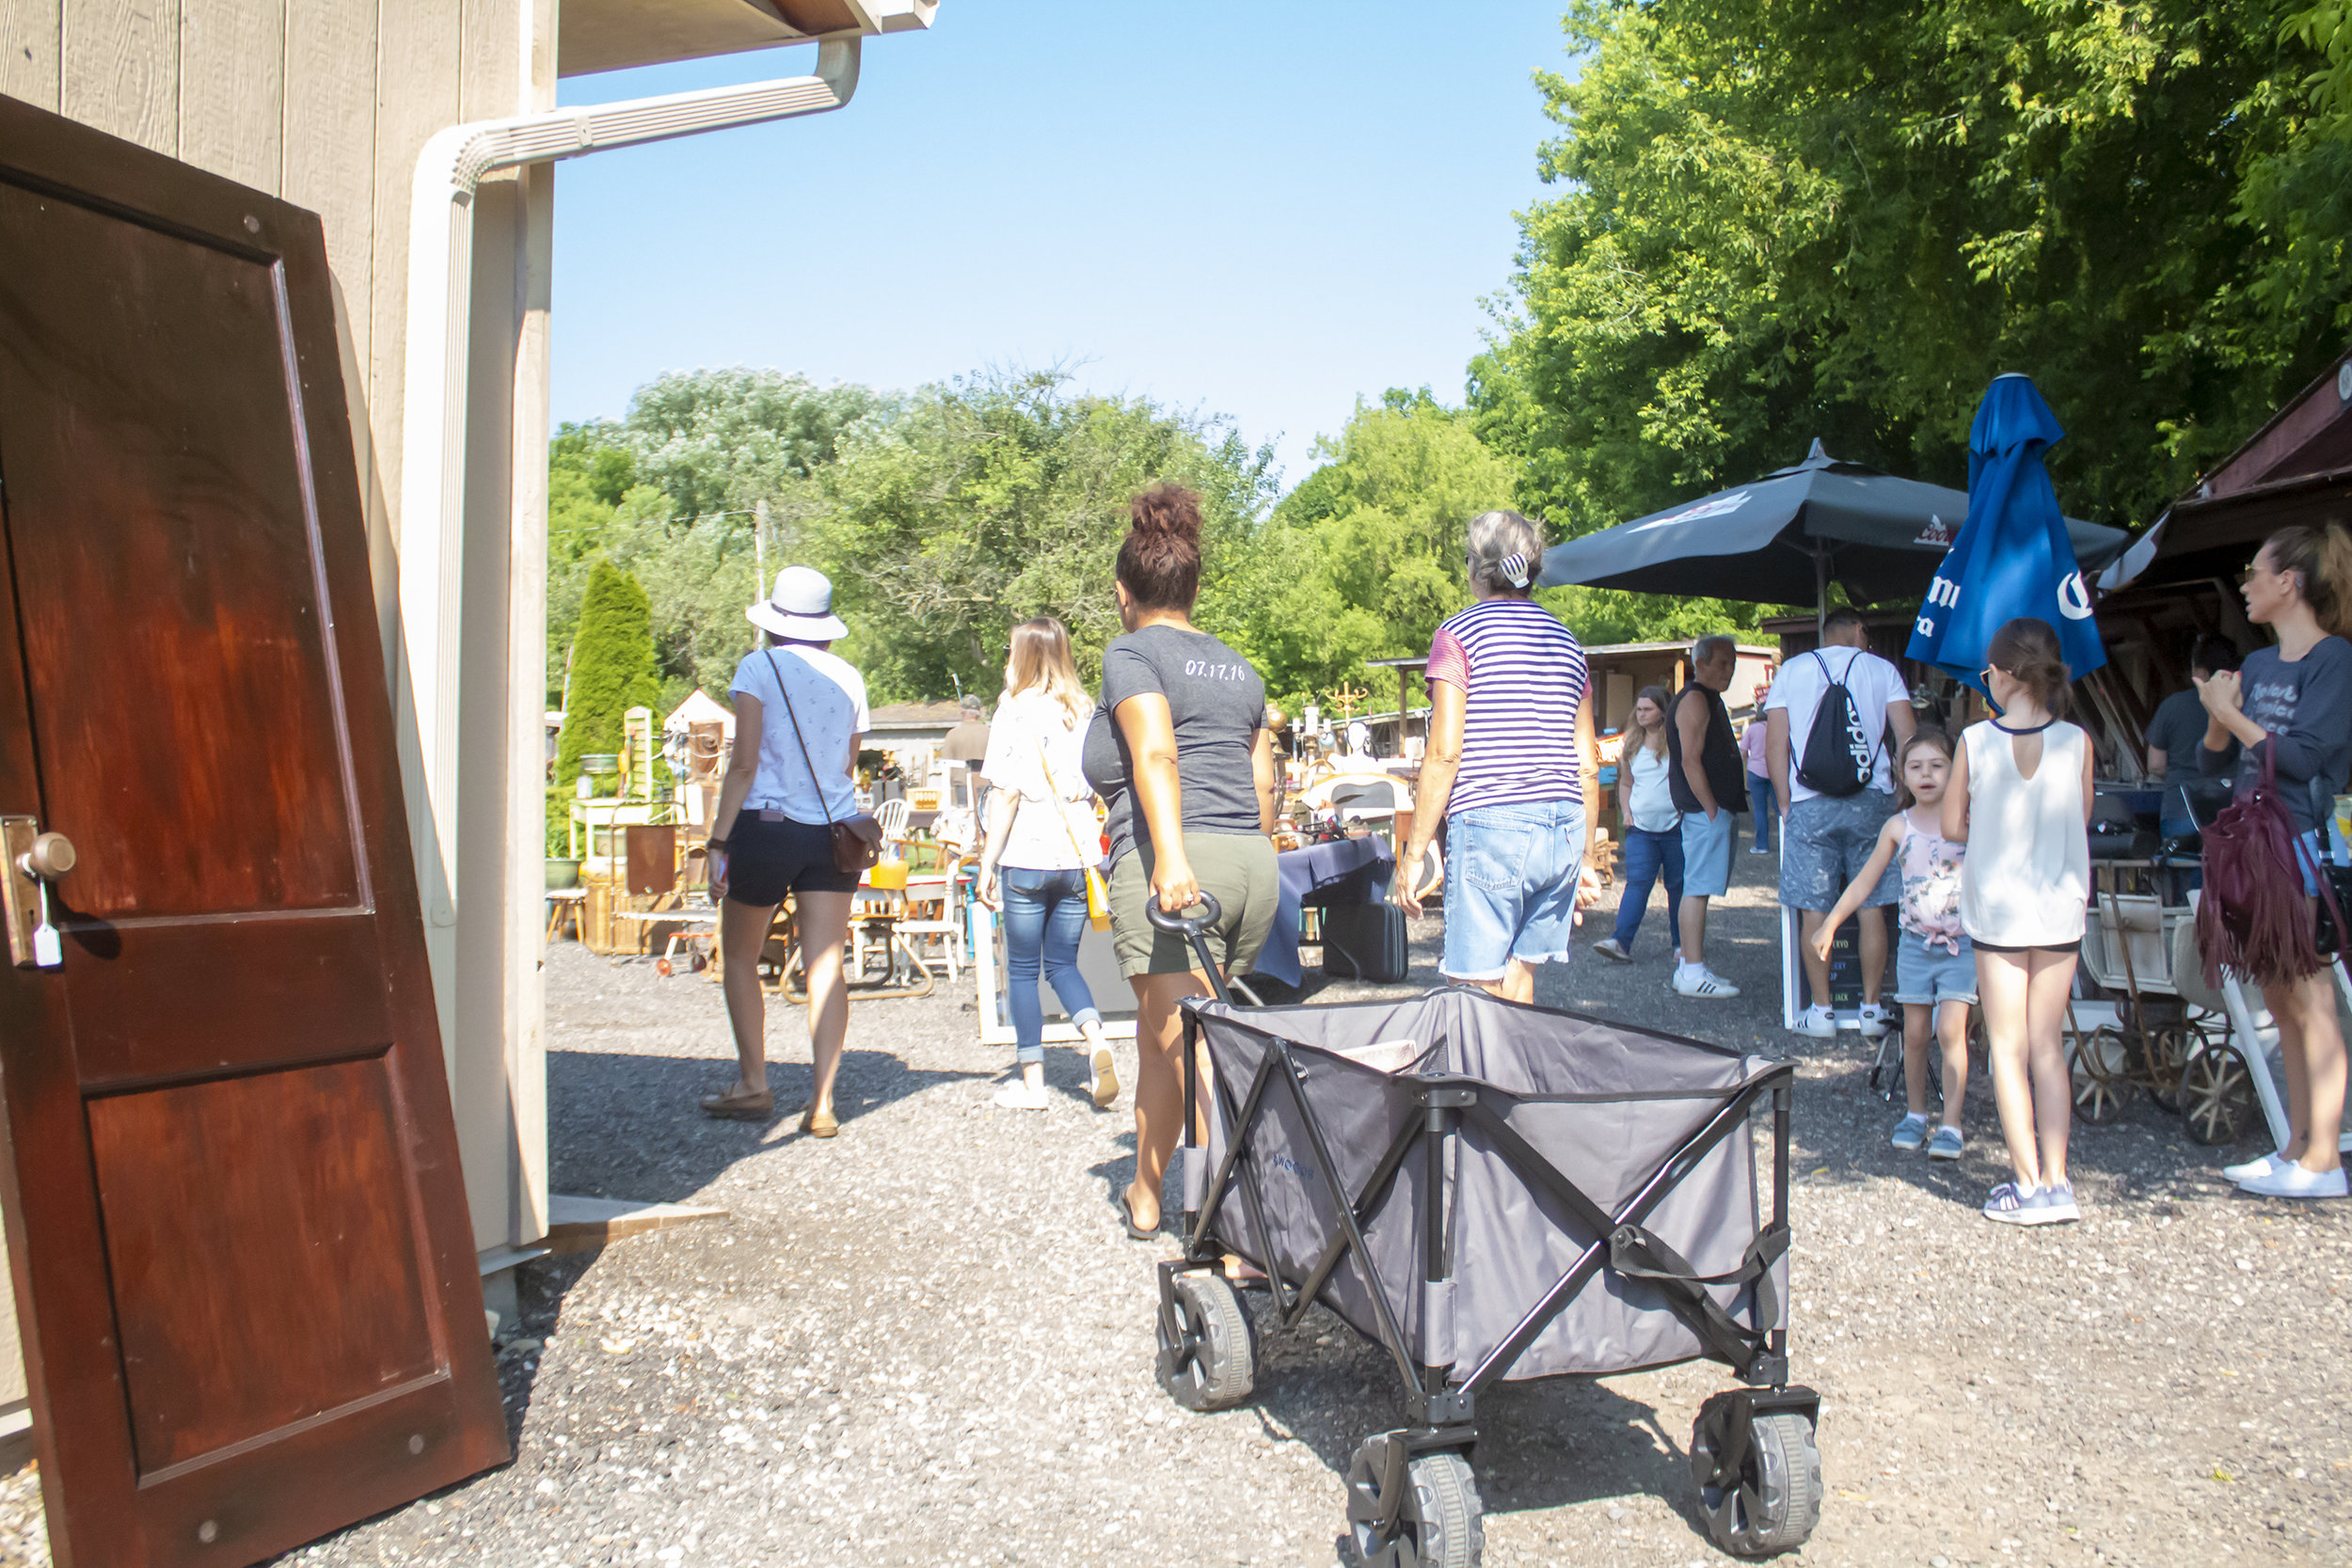 How to Shop Antique Markets - Multiple Walk throughs